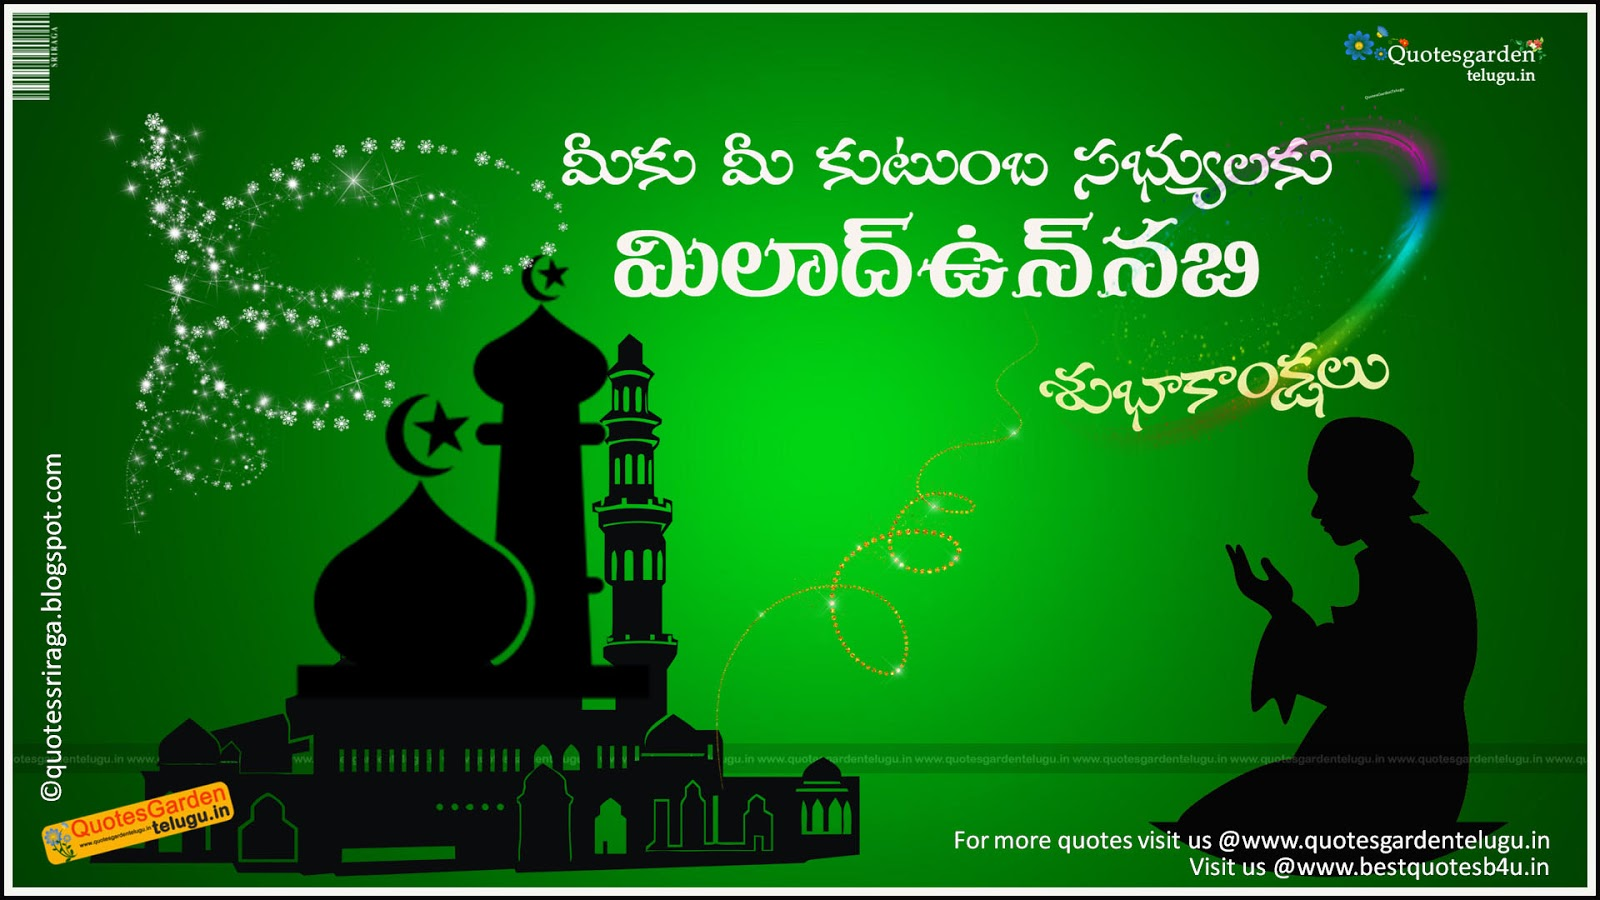 Happy Milad Un Nabi Greetings In Telugu Quotes Garden Telugu